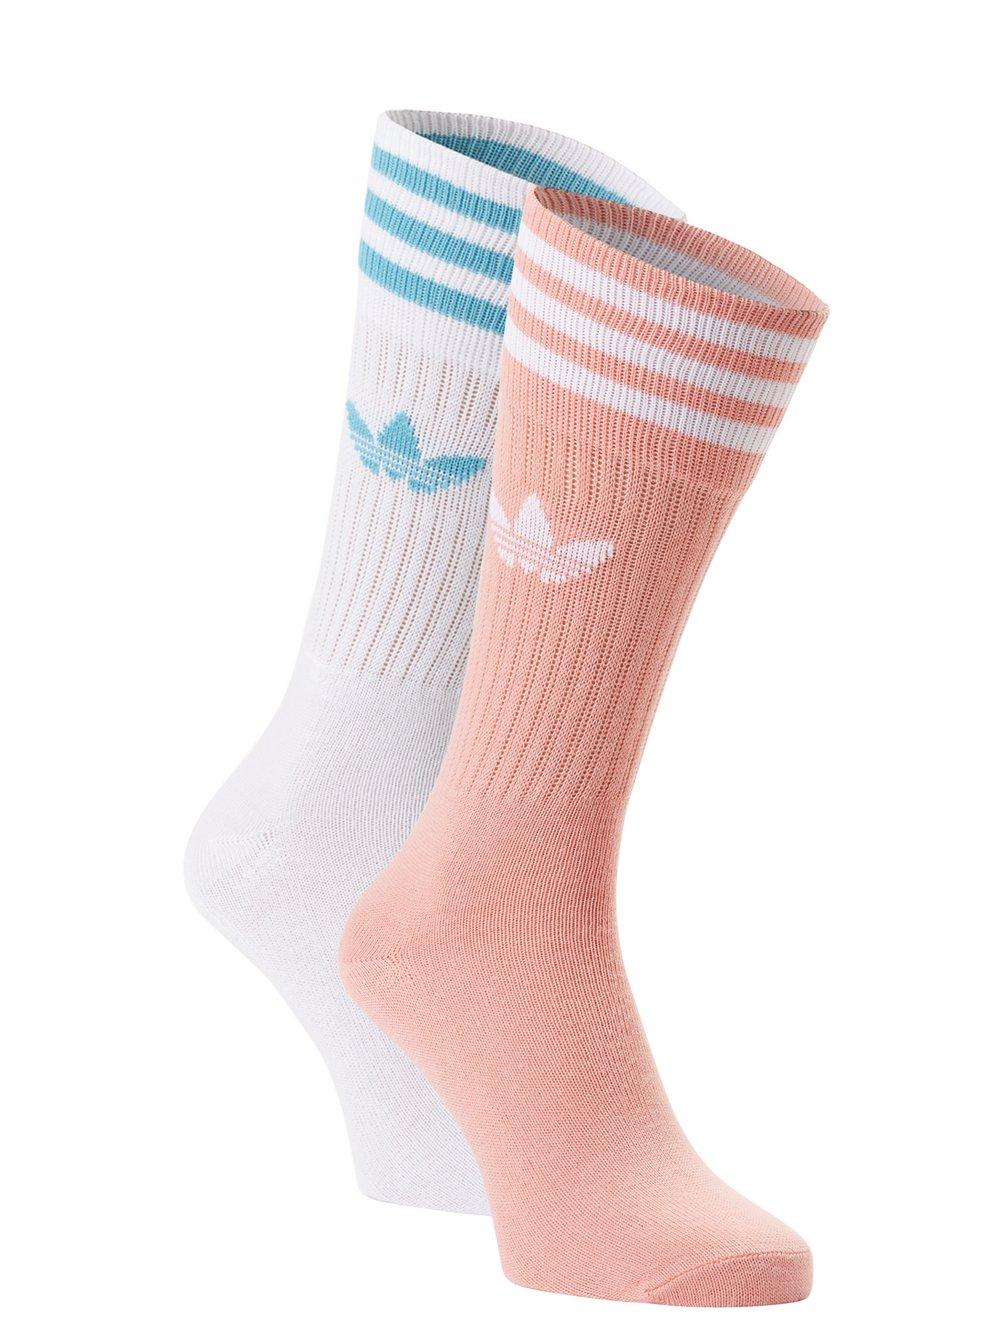 0de16172f997f9 adidas Originals Skarpety damskie pakowane po 2 szt. kup online ...